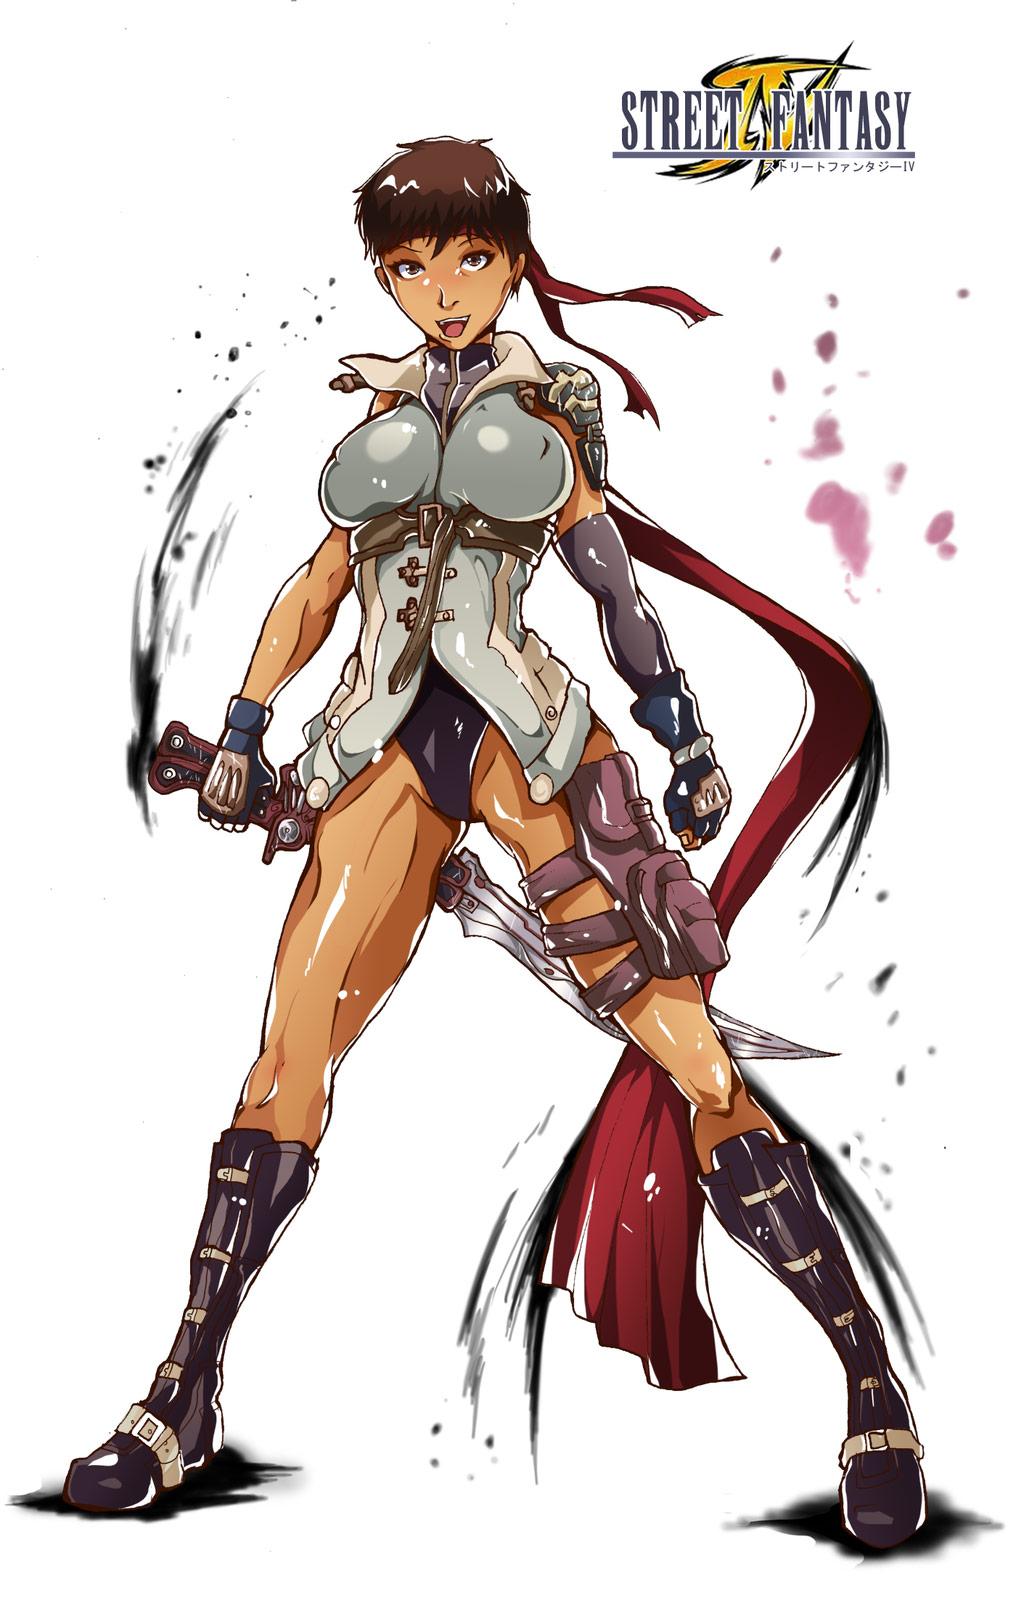 Final Fantasy X Street Fighter artwork - Sakura, Cammy, Chun-Li and ...